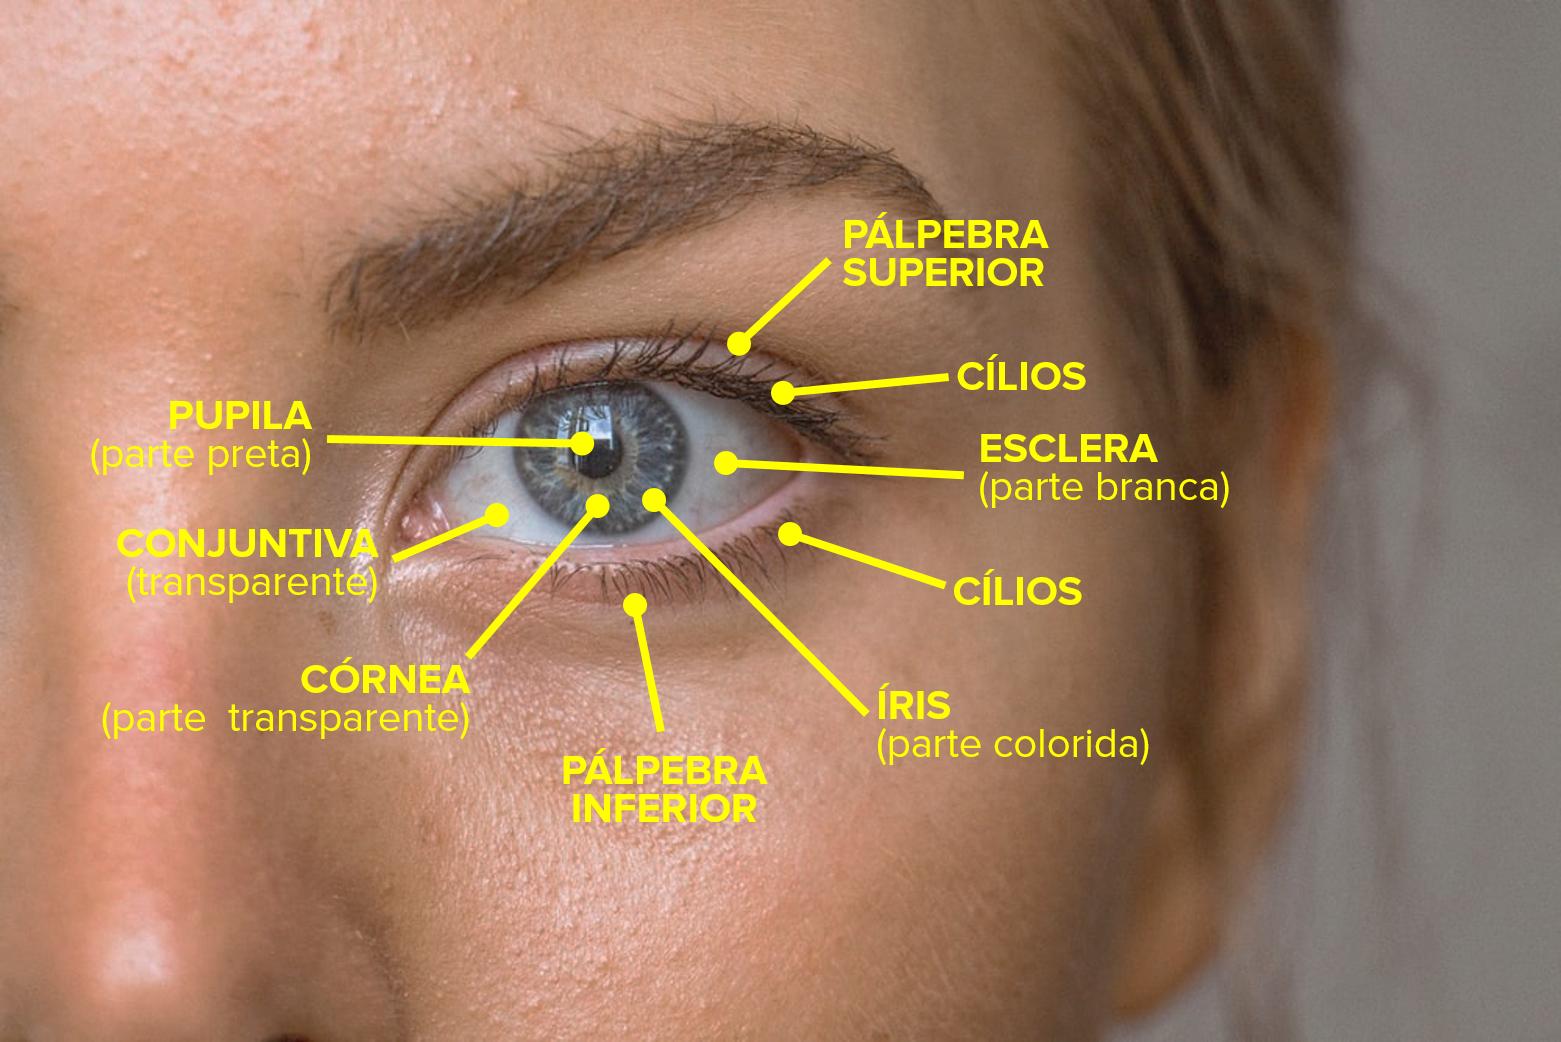 partes externas do olho (iris, pupila, cornea, esclera, pálpebra, cílios, conjuntiva)